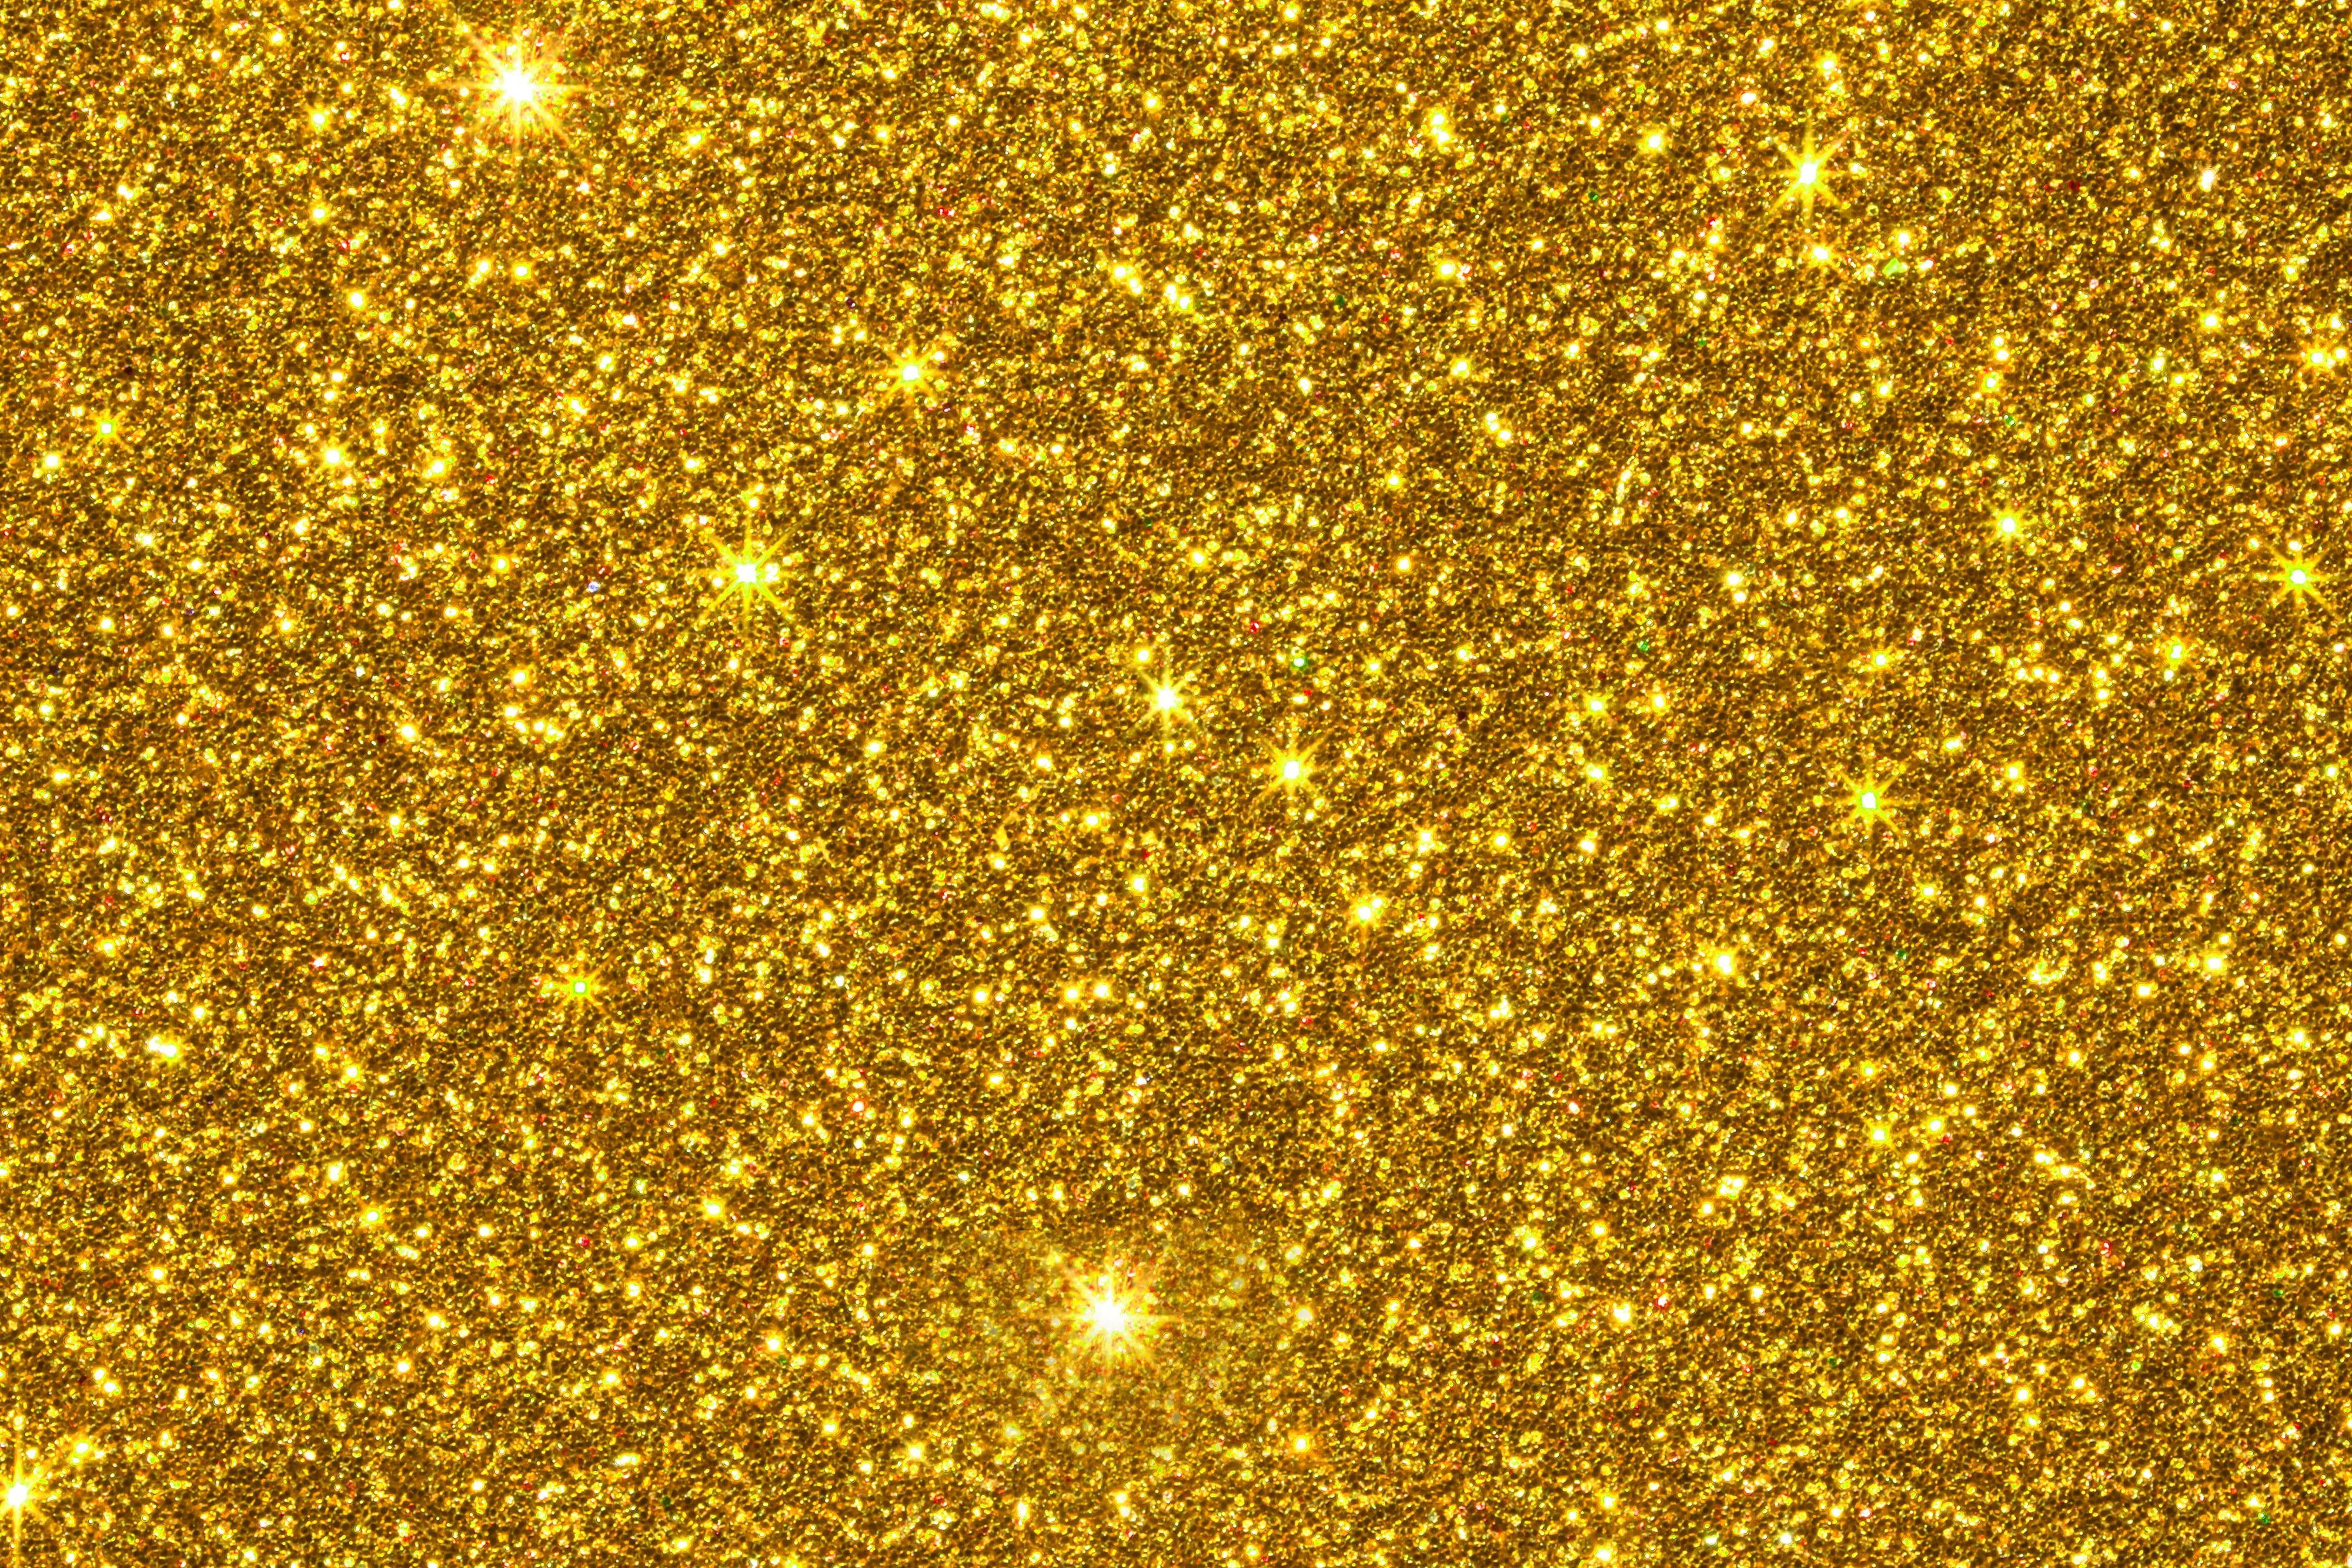 Background Sequins Golden Gold Texture Shine Glitter 4k Wallpaper Hdwallpaper D In 2020 Gold Texture Background Backdrops Backgrounds Glitter Shower Curtain